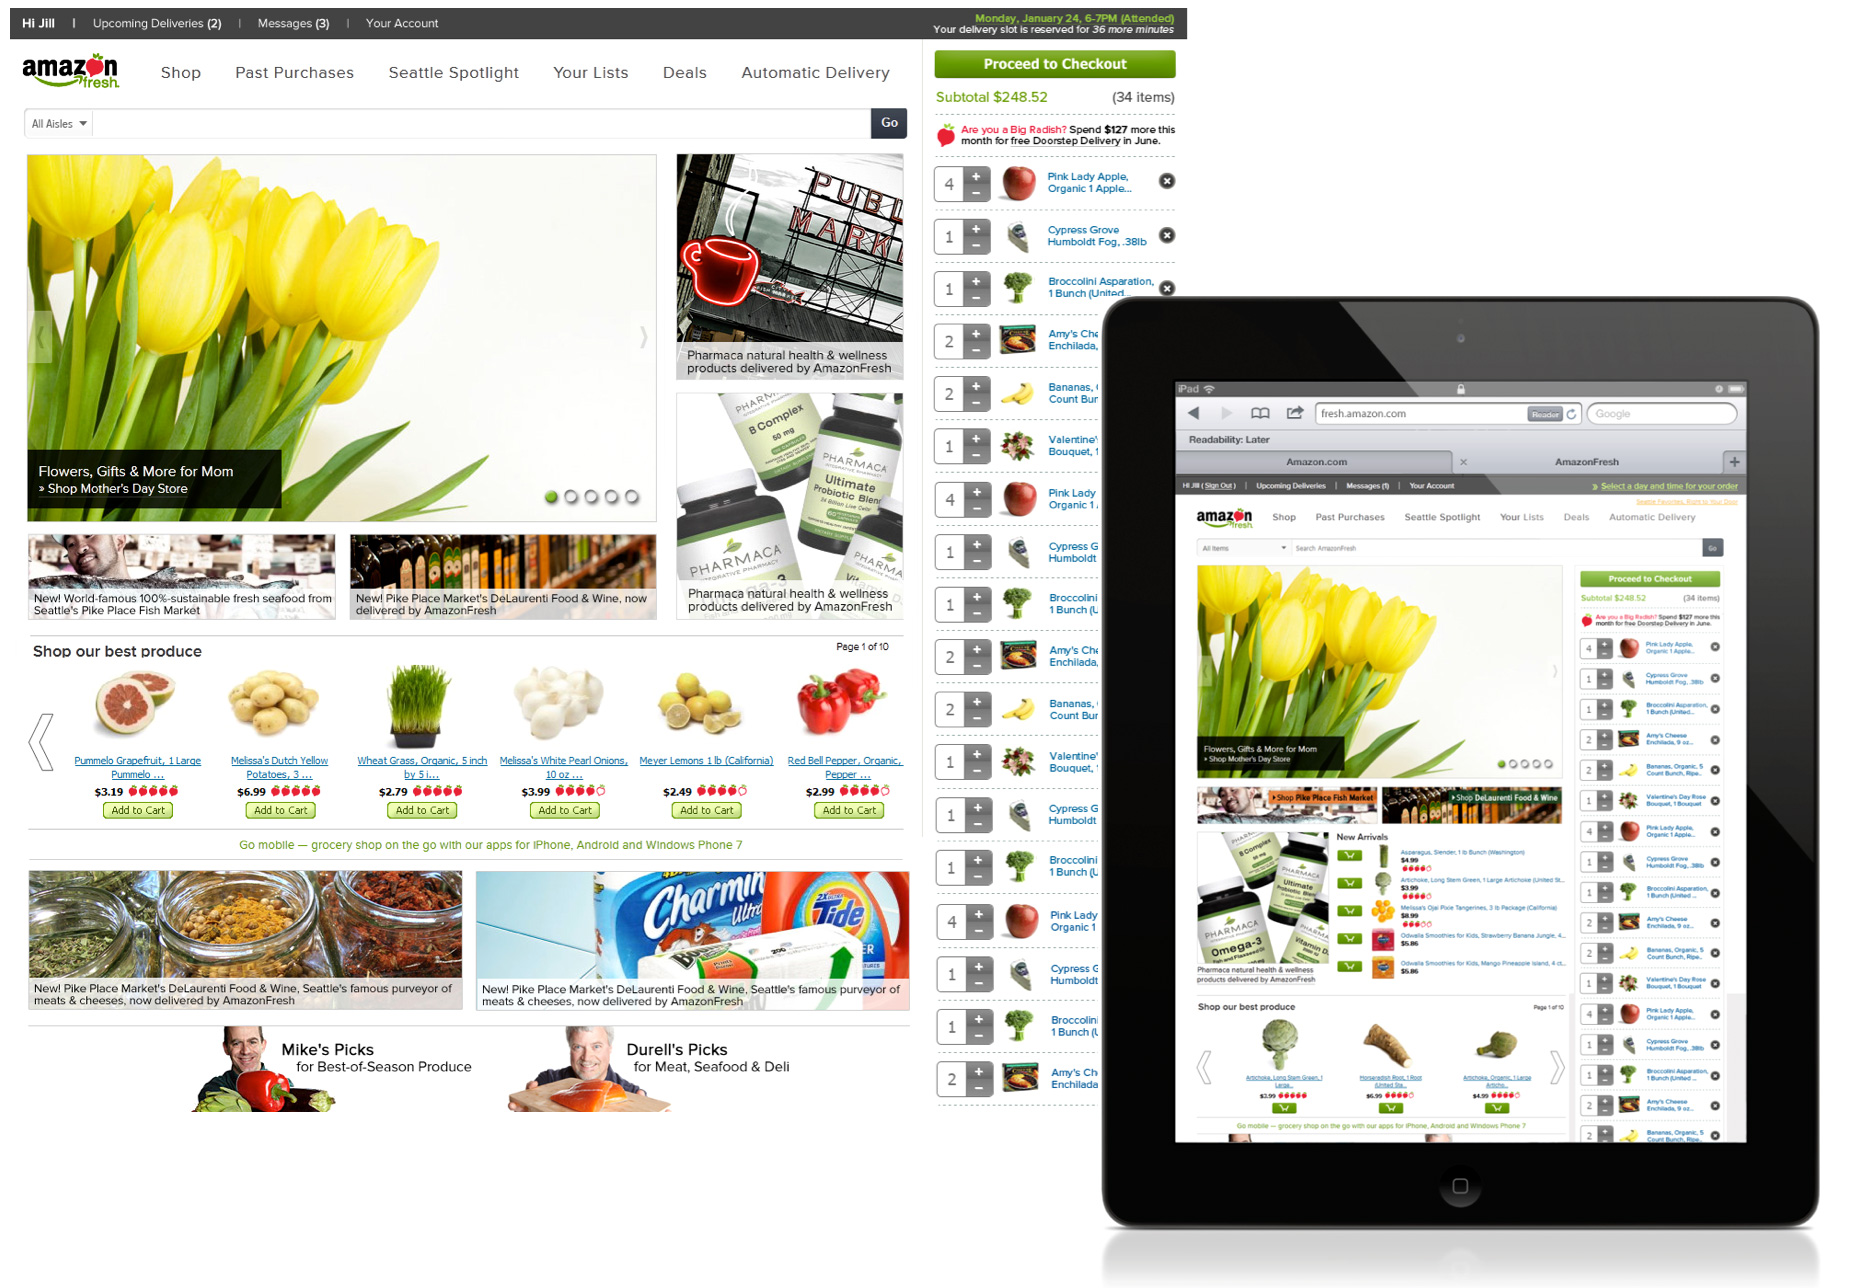 Amazon Fresh Redesign - AmazonFresh.com standalone site redesign.Role: Sole UX and Visual Designer Launch: Summer 2012